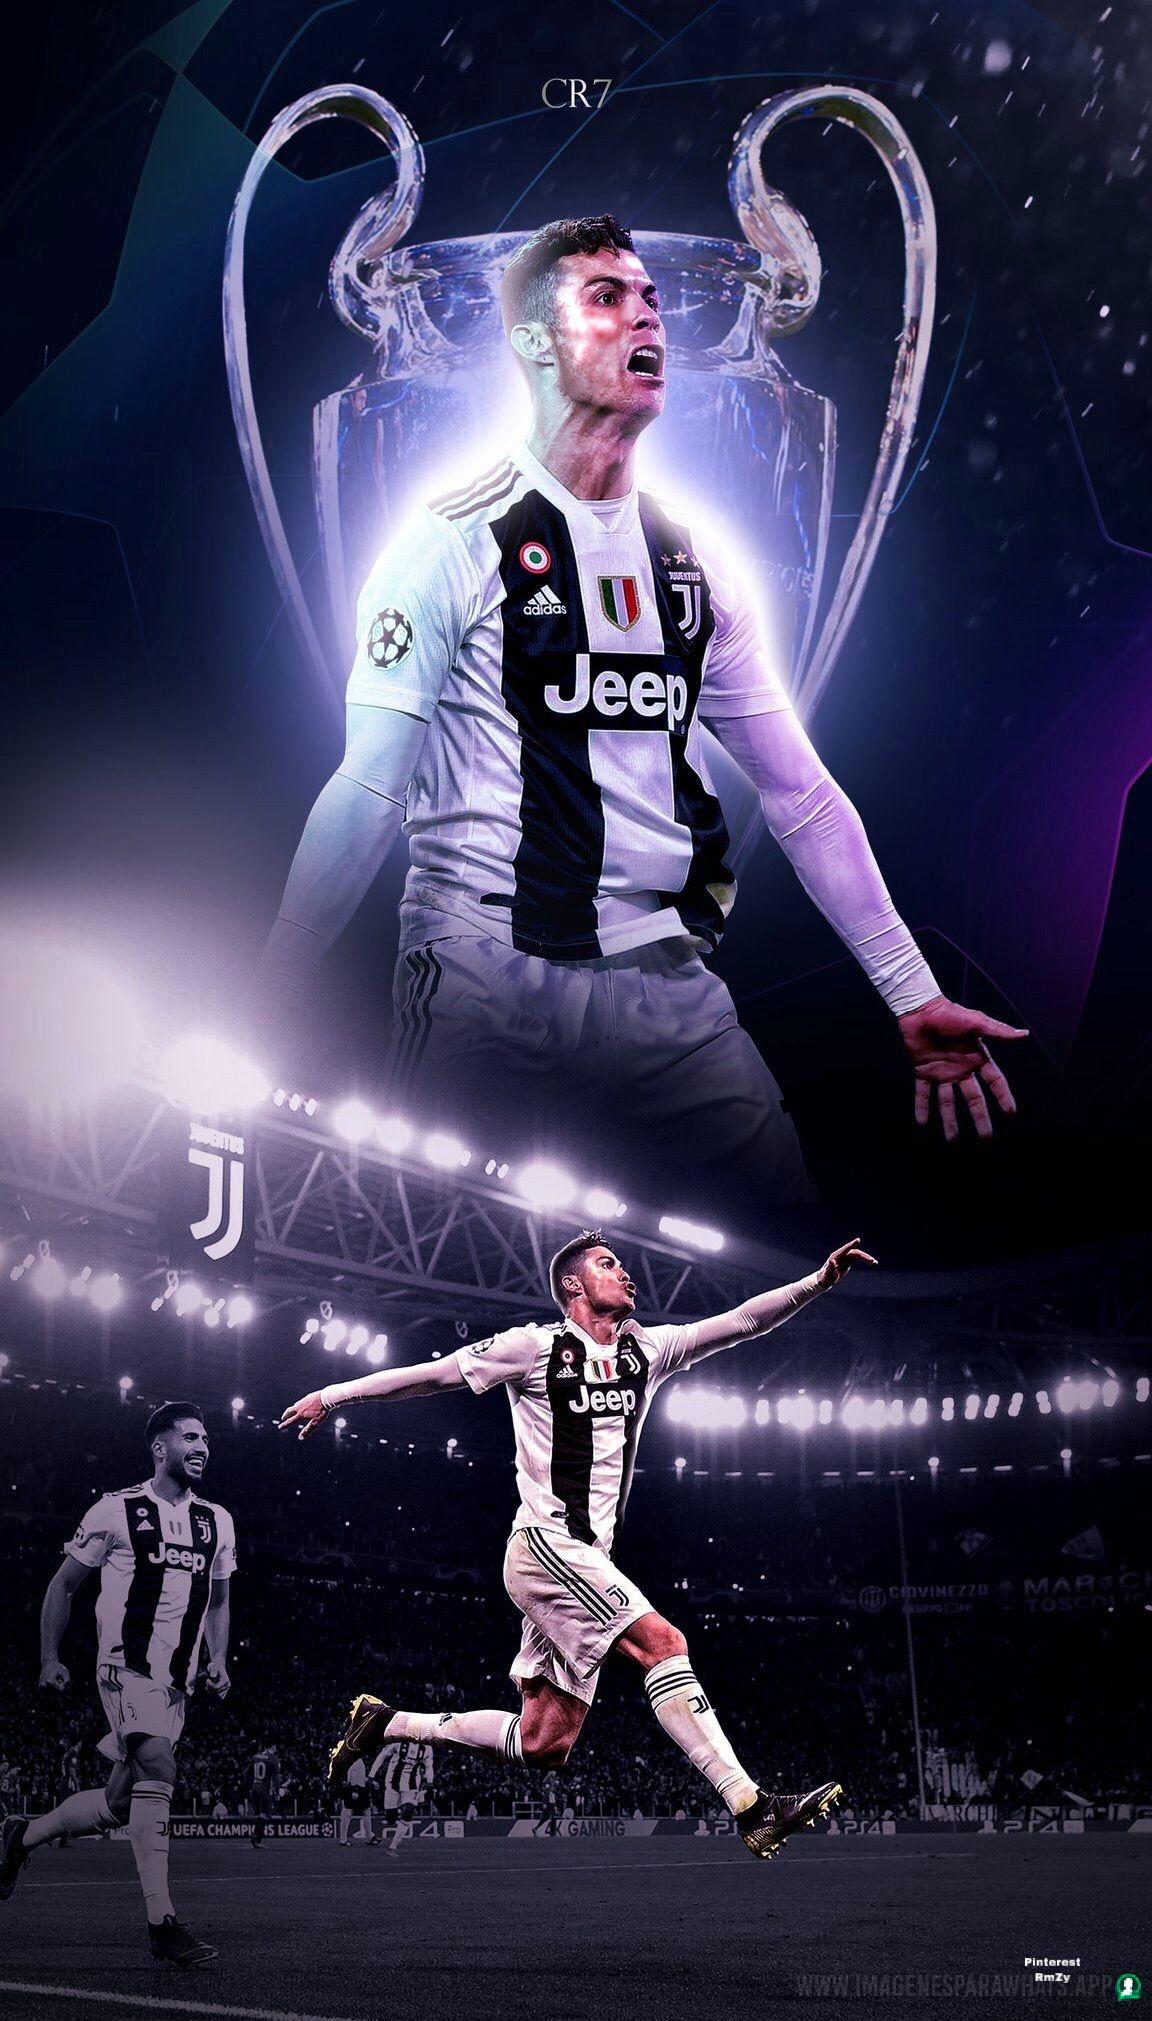 Imagenes de Futbol (1212)